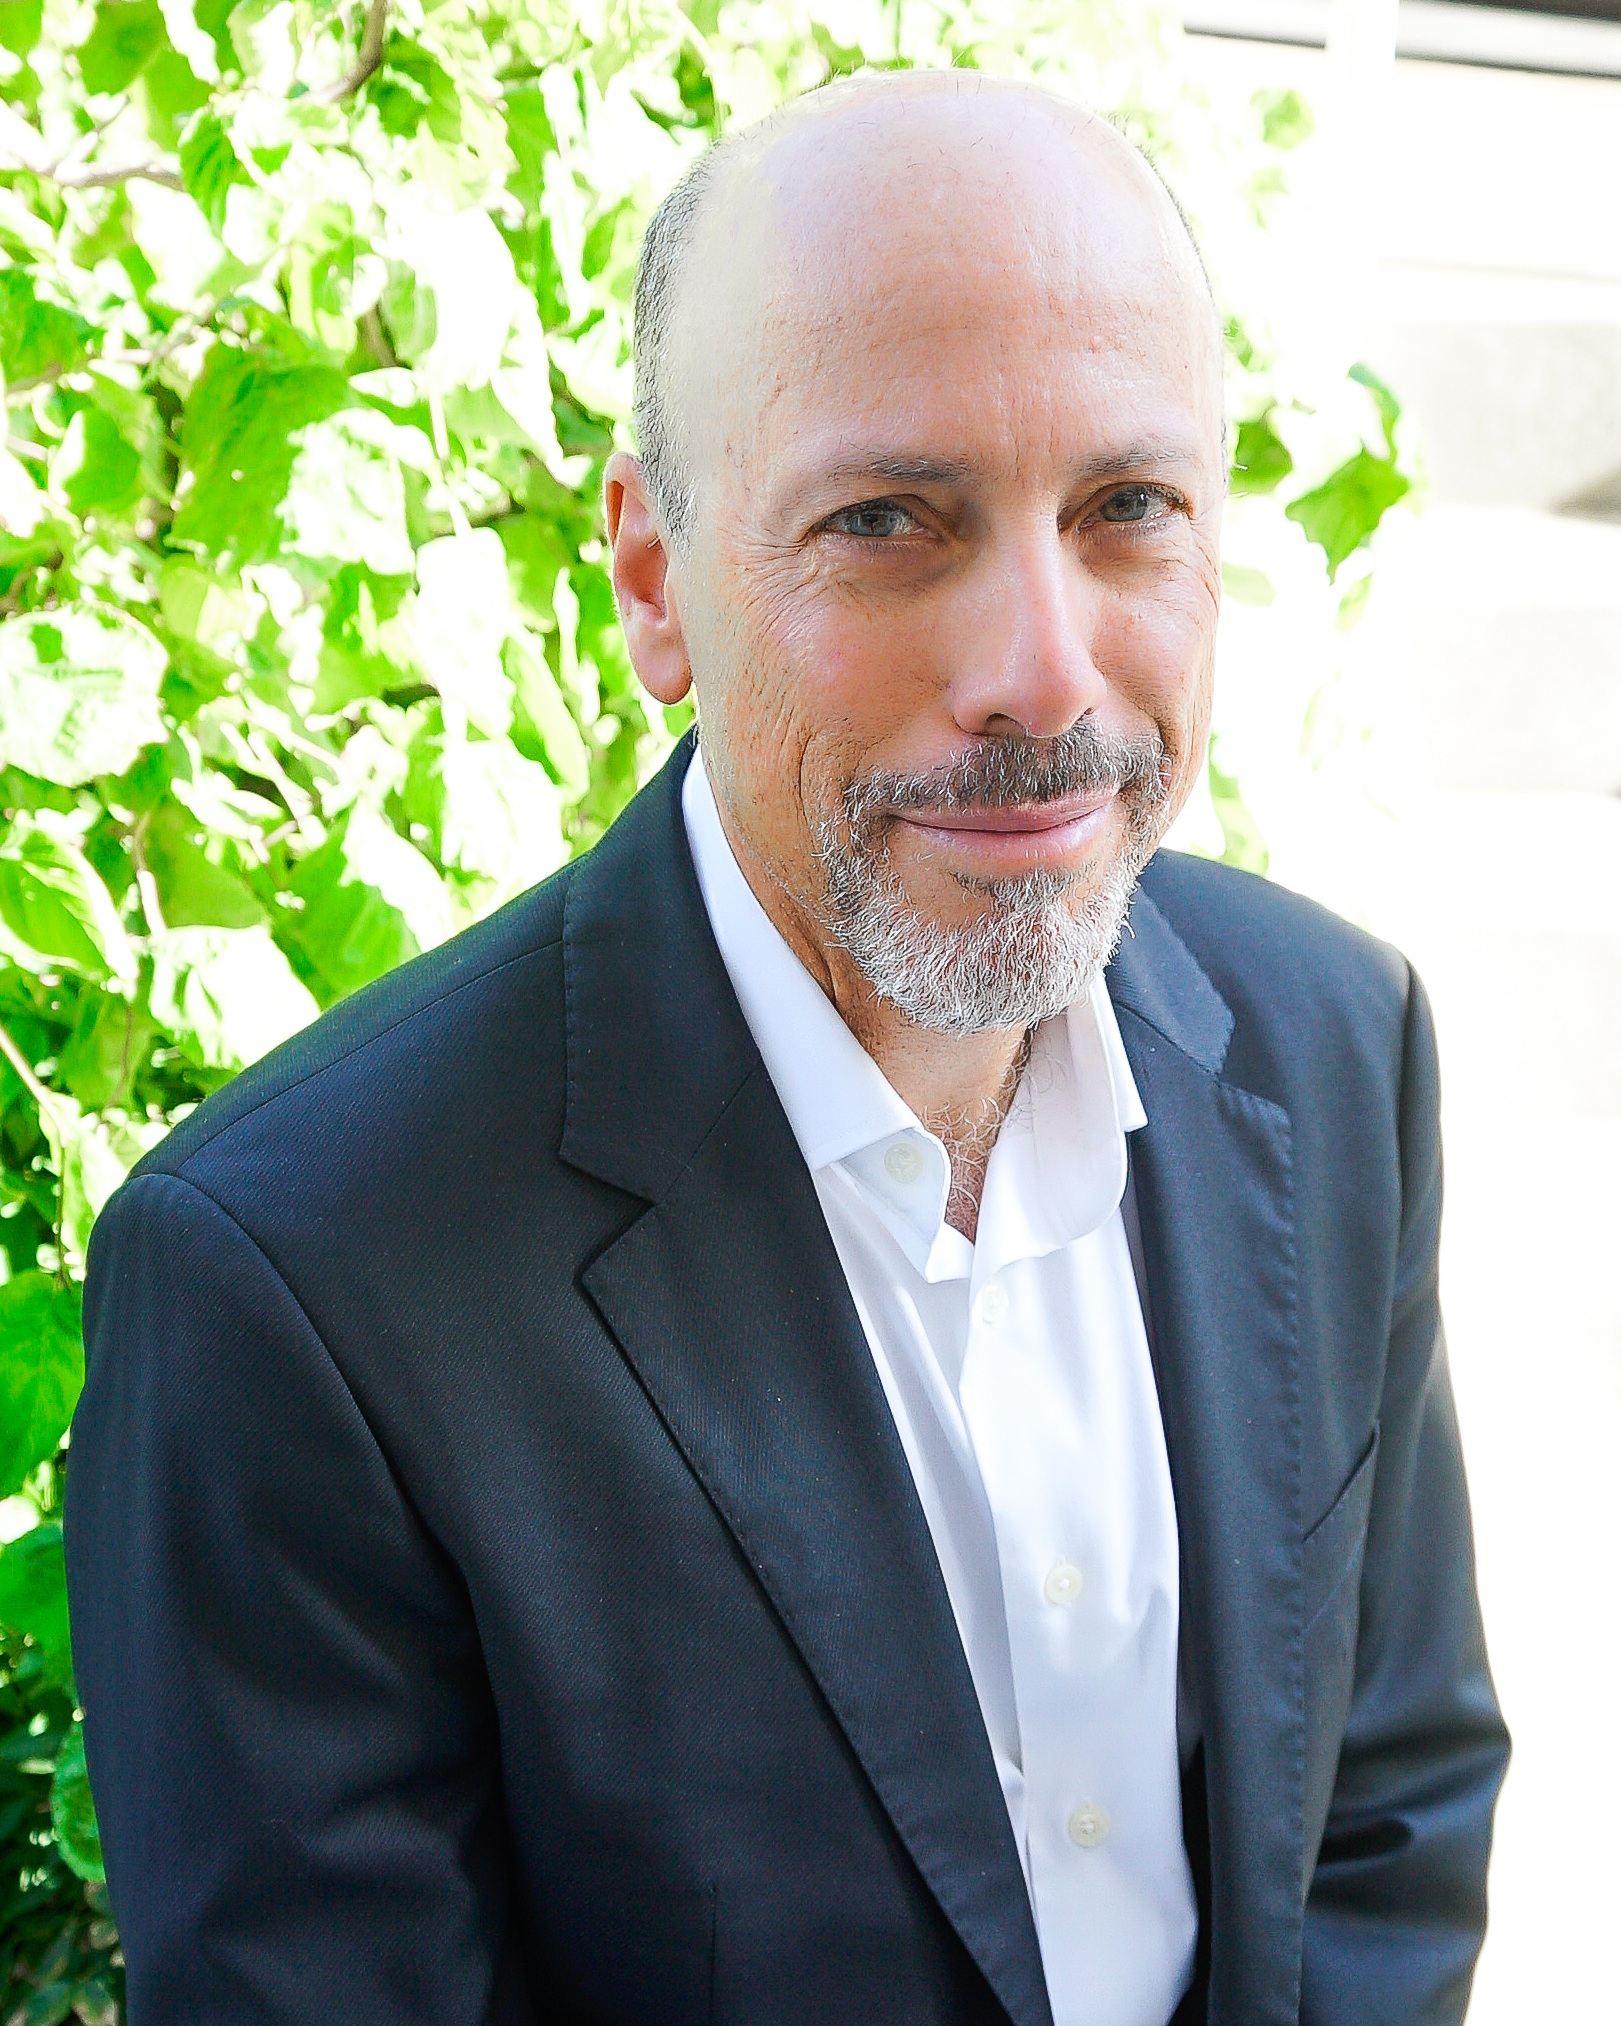 Todd Appel, Managing Director